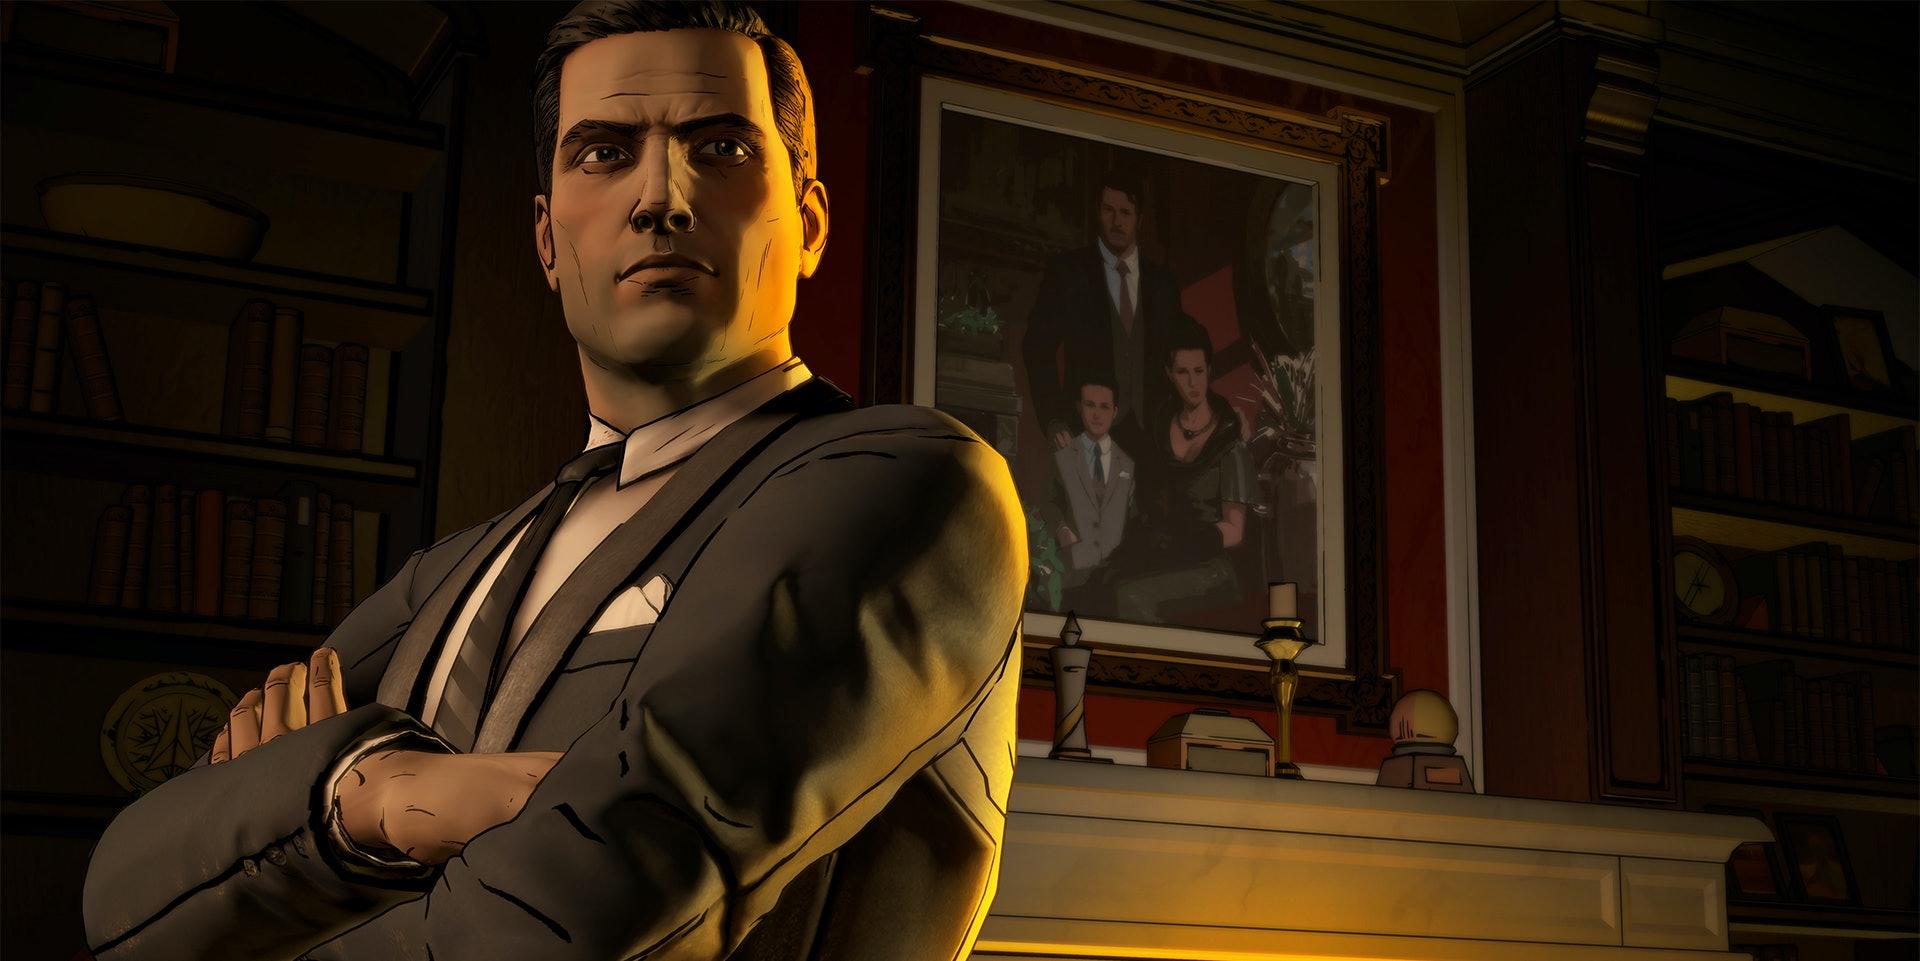 Screenshot from the Batman The Telltale Series video game.